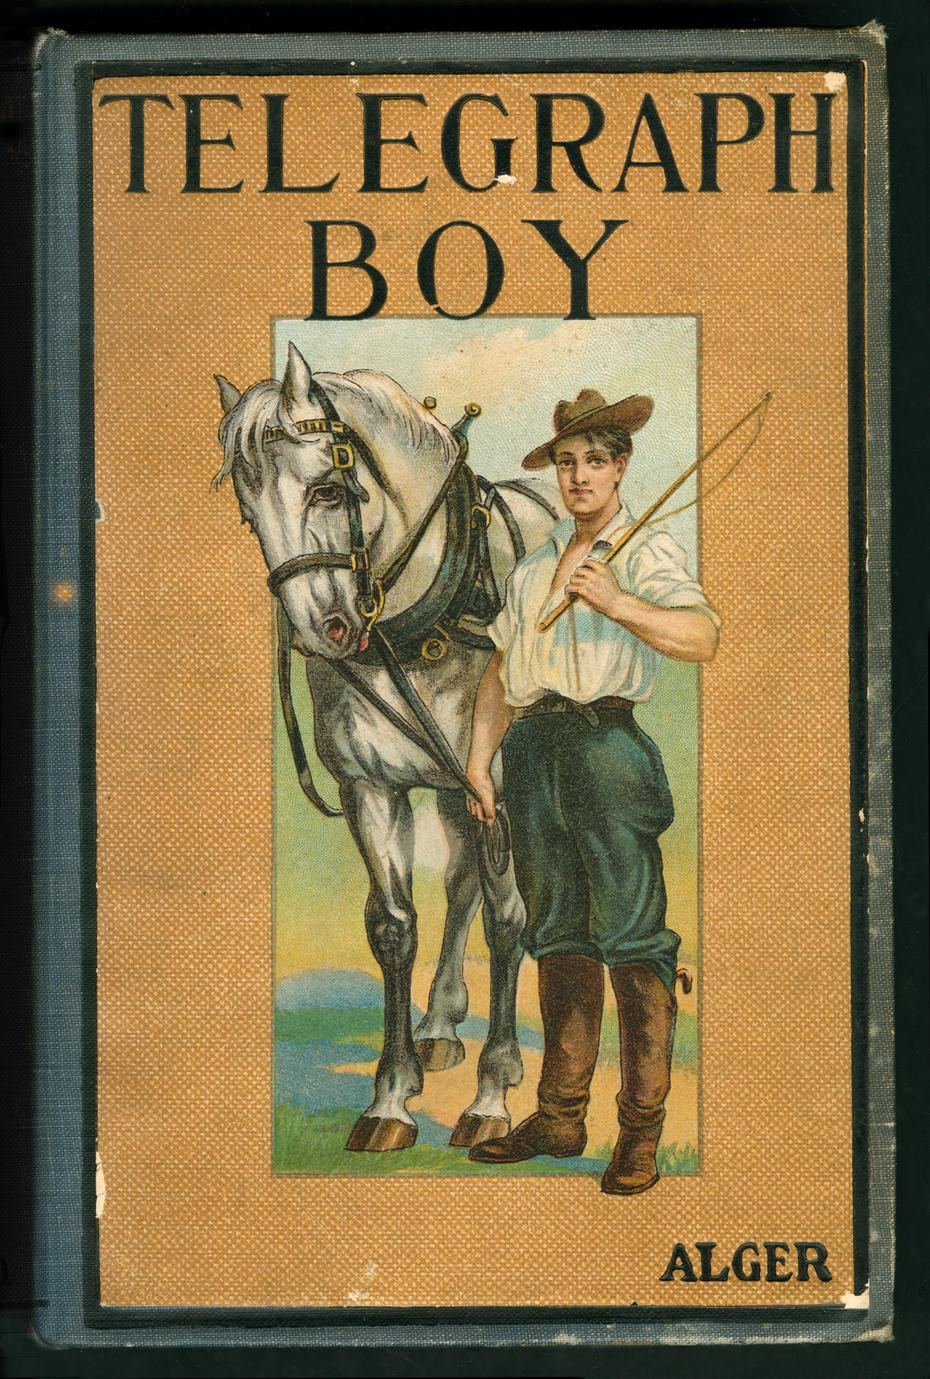 The telegraph boy (1 of 2)